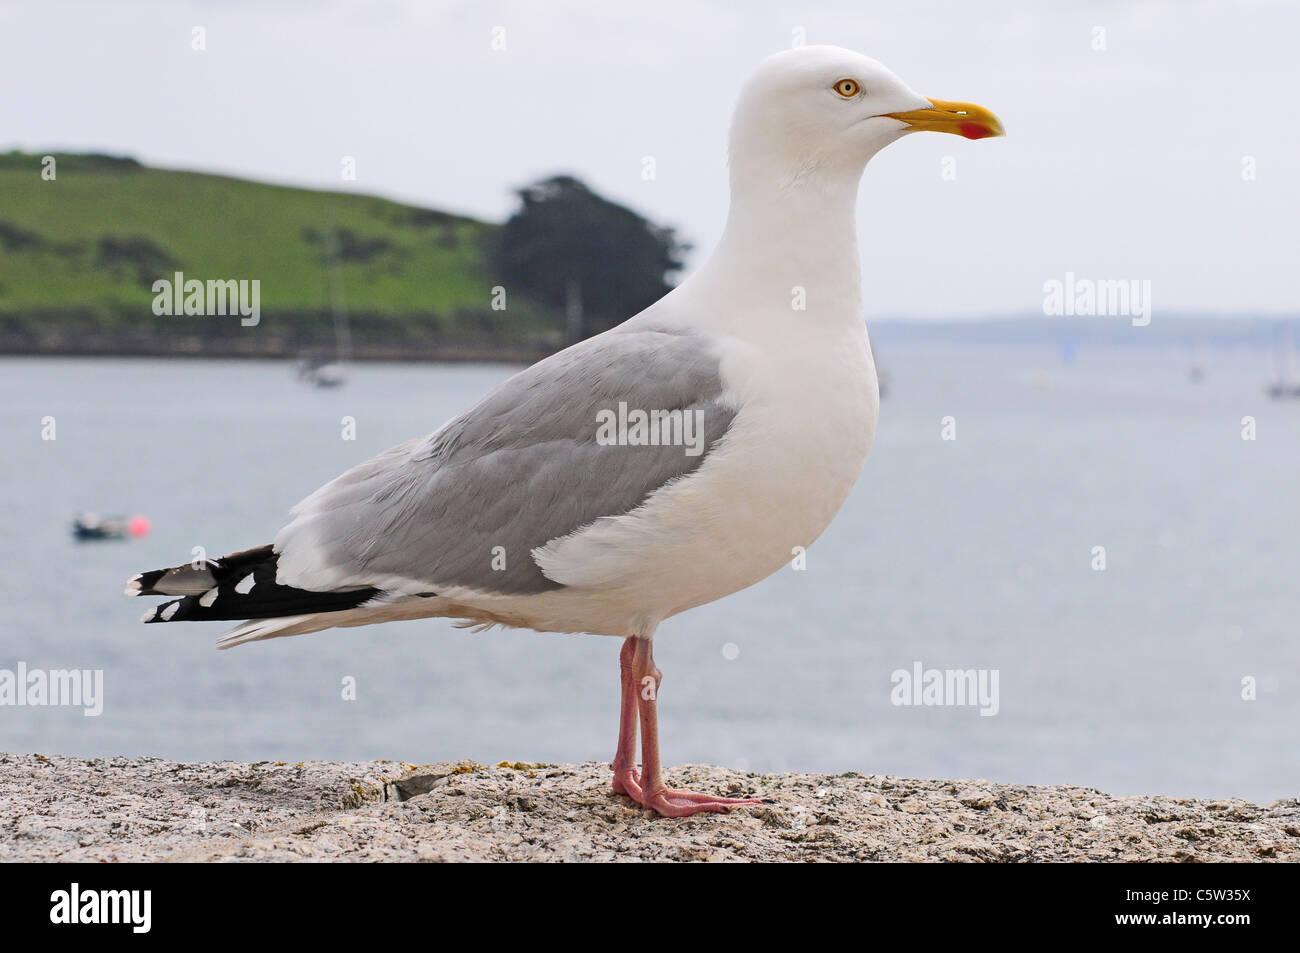 Herring Gull Larus argentatus standing on sea wall. - Stock Image